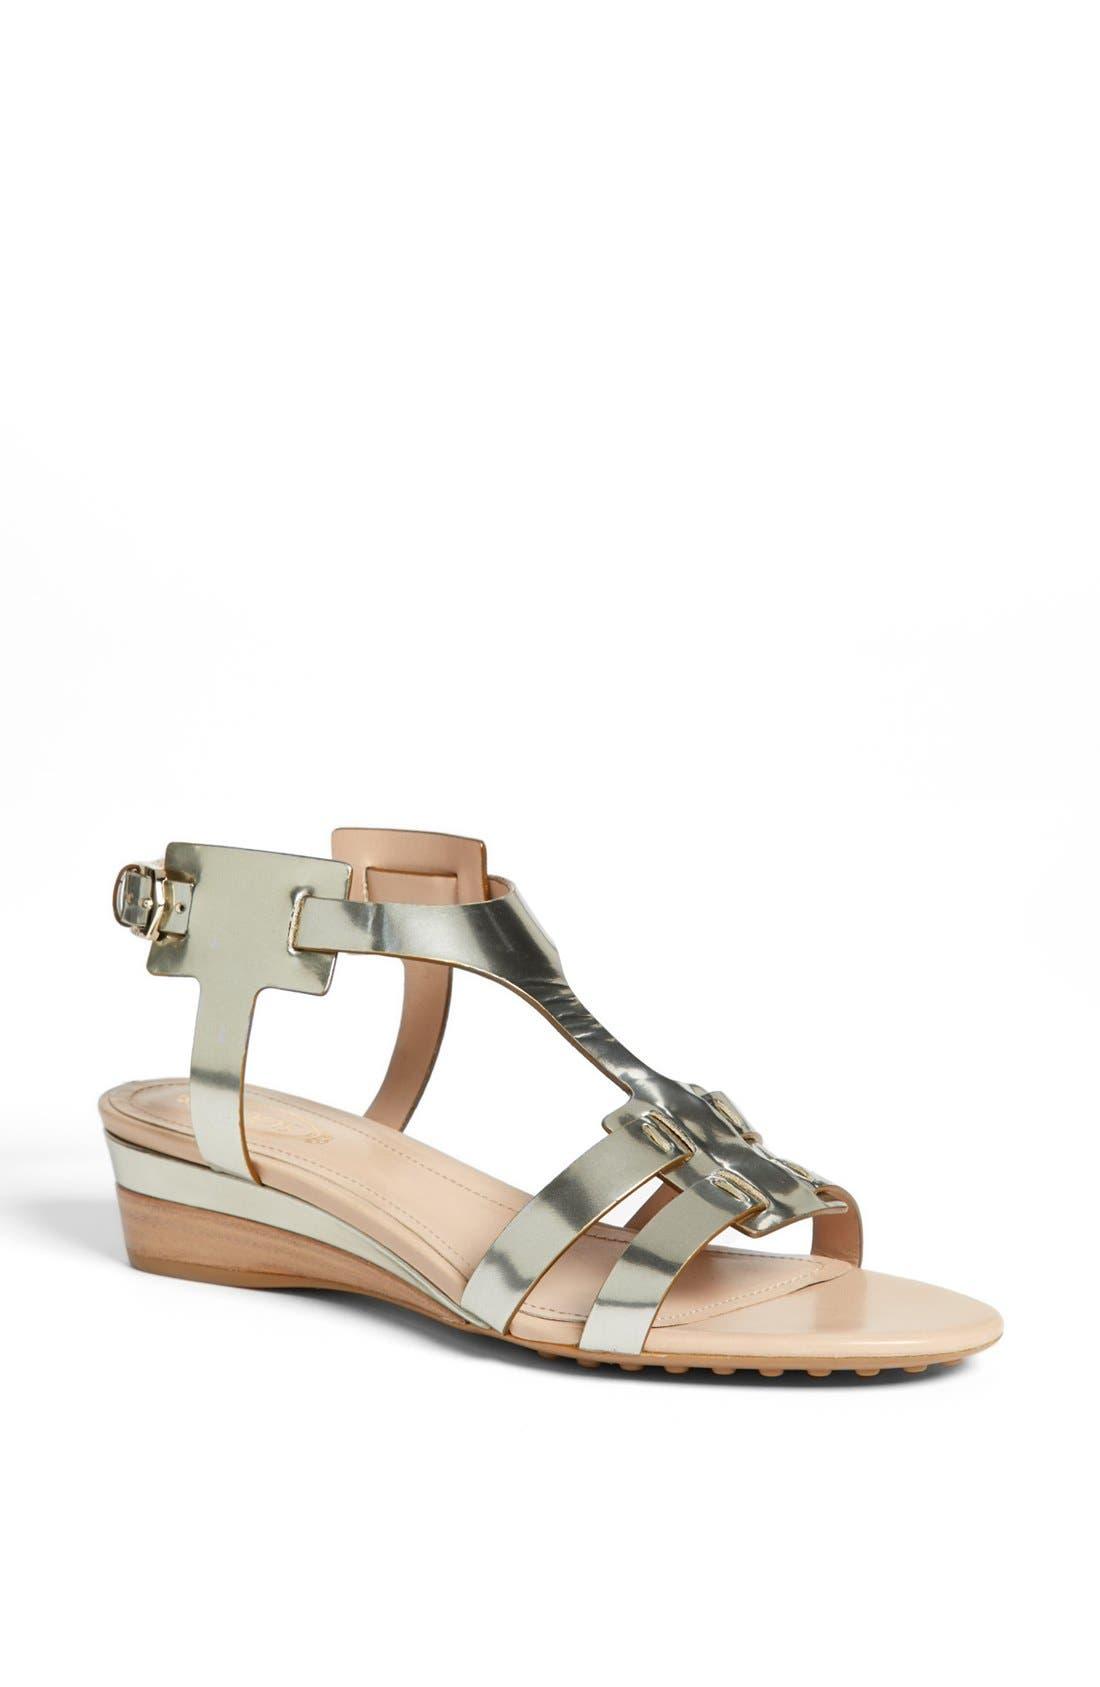 Main Image - Tod's 'Zeppa' Wedge Sandal